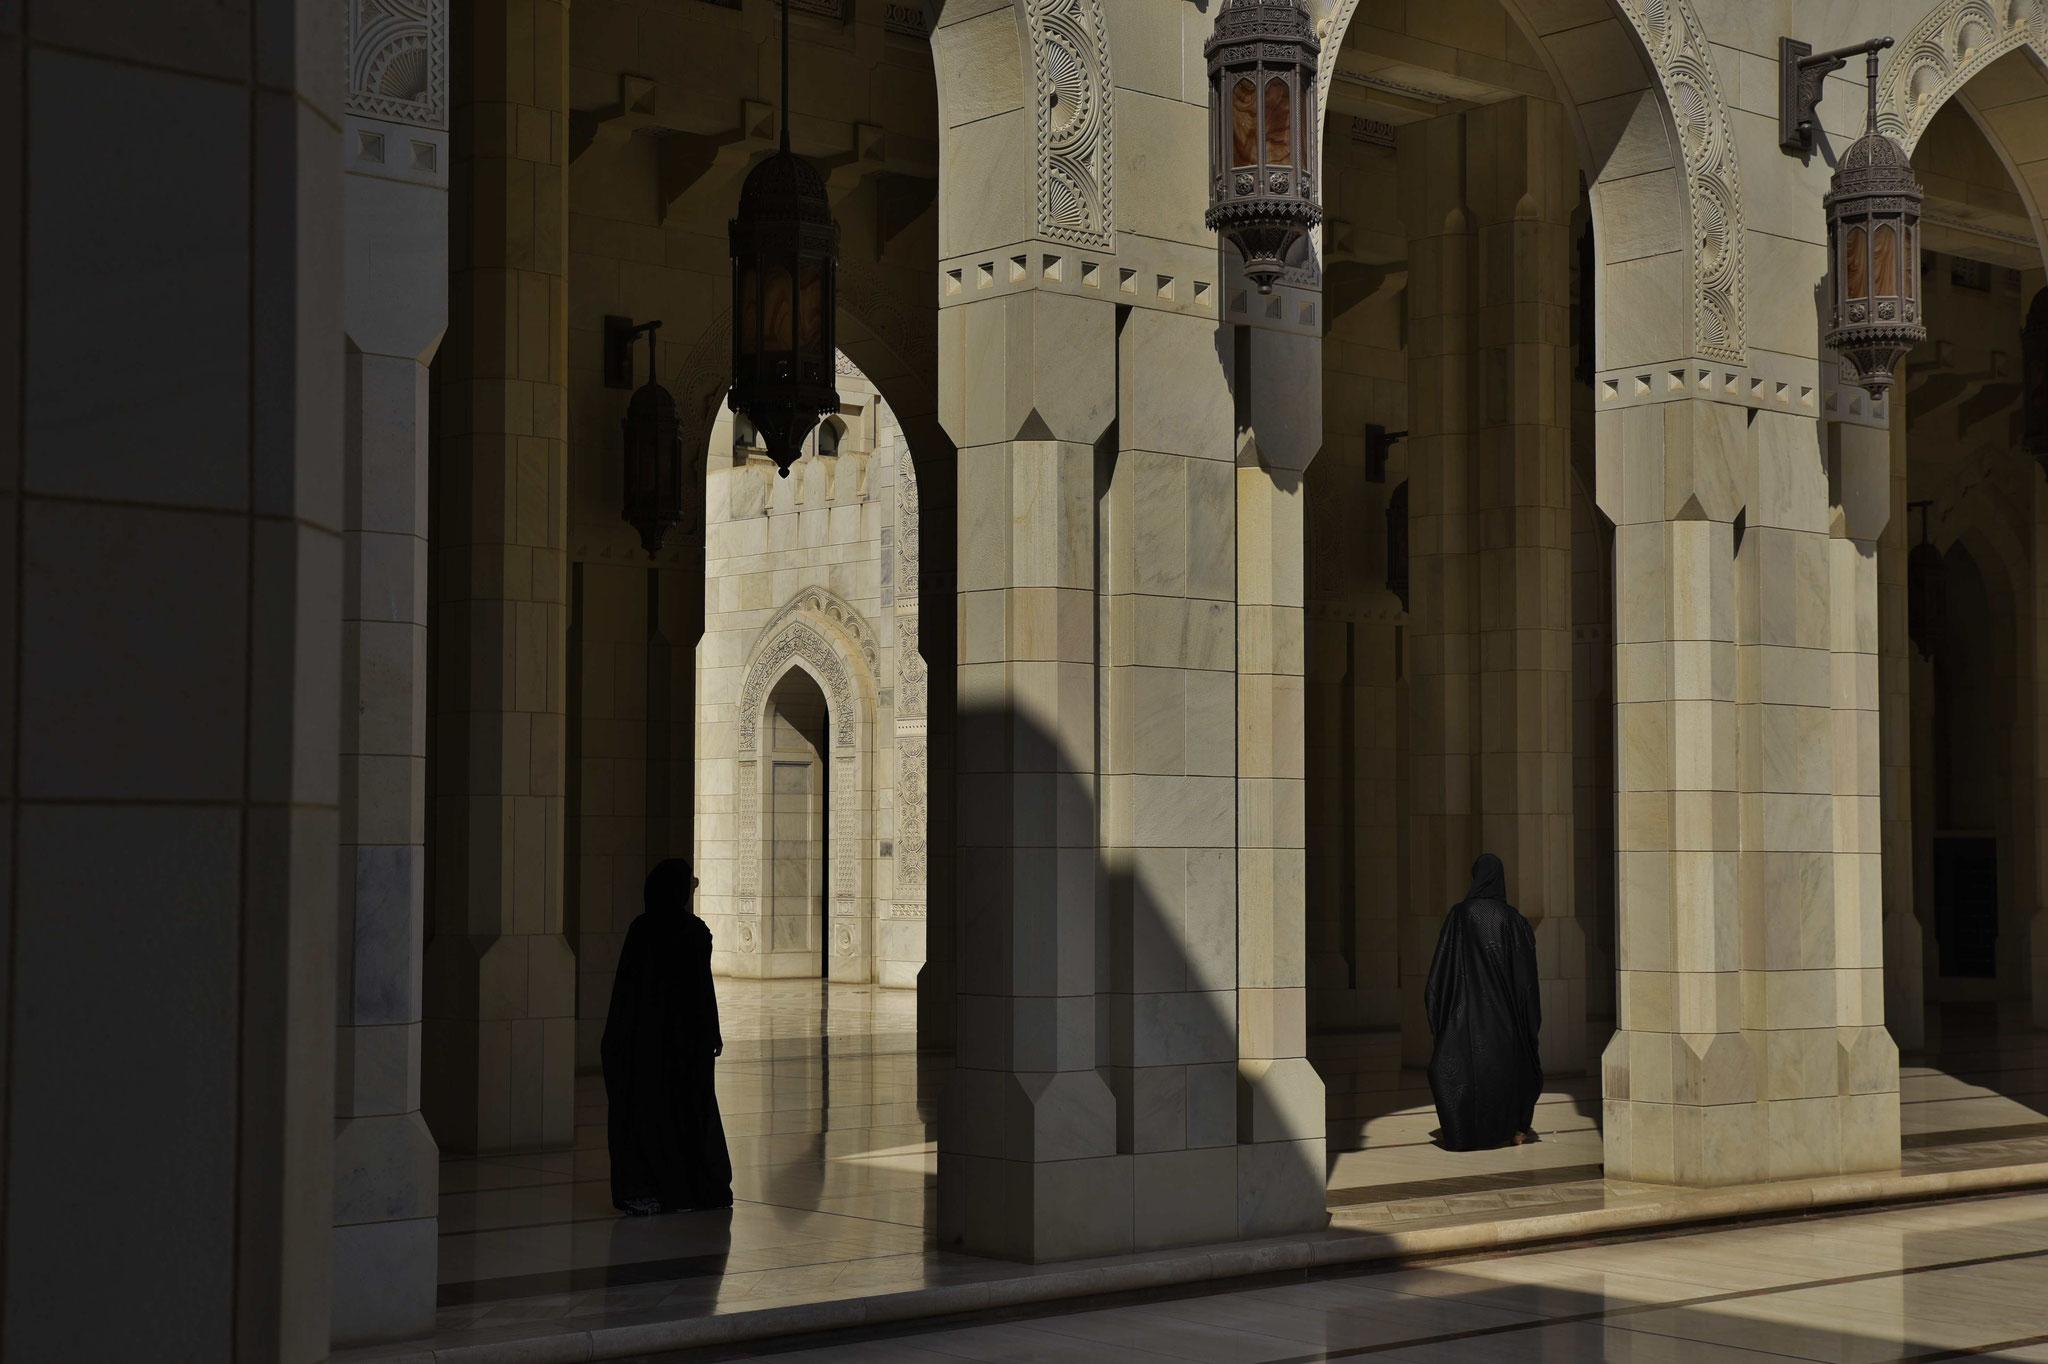 Säulengang mit 2 als Muslime verkleidete Touristinnen